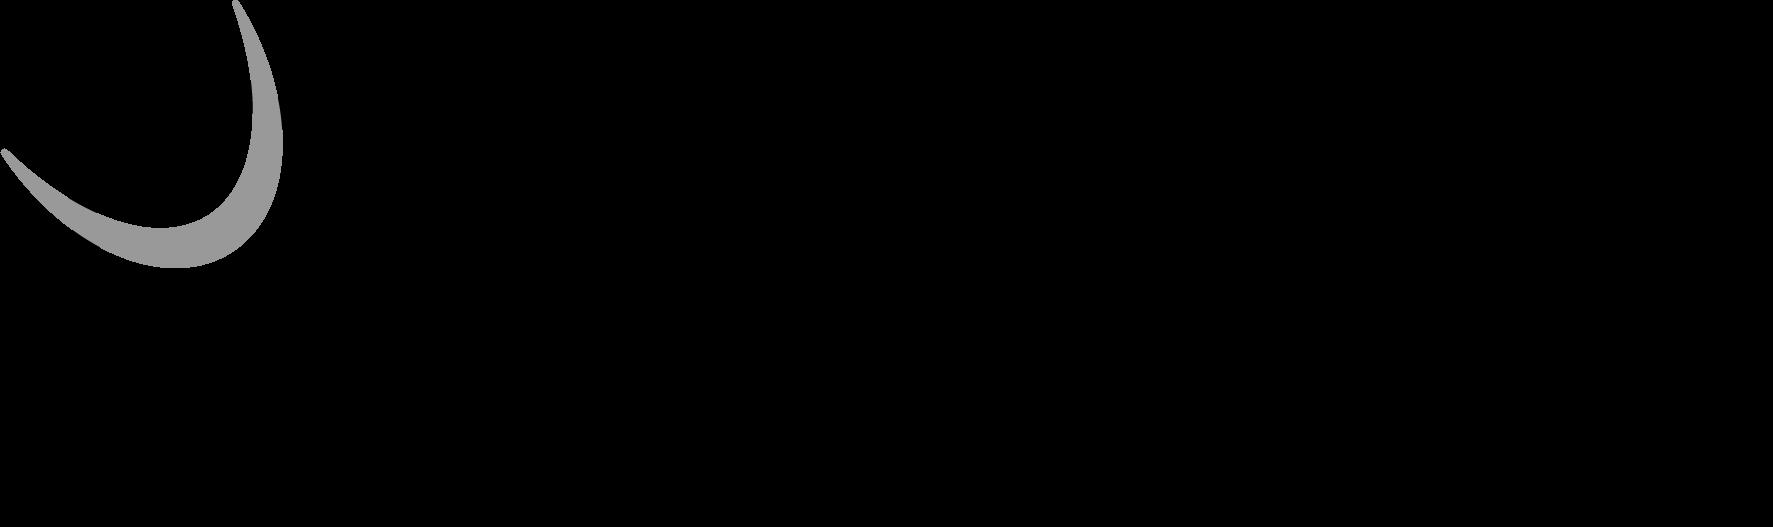 aplan_viak-logo